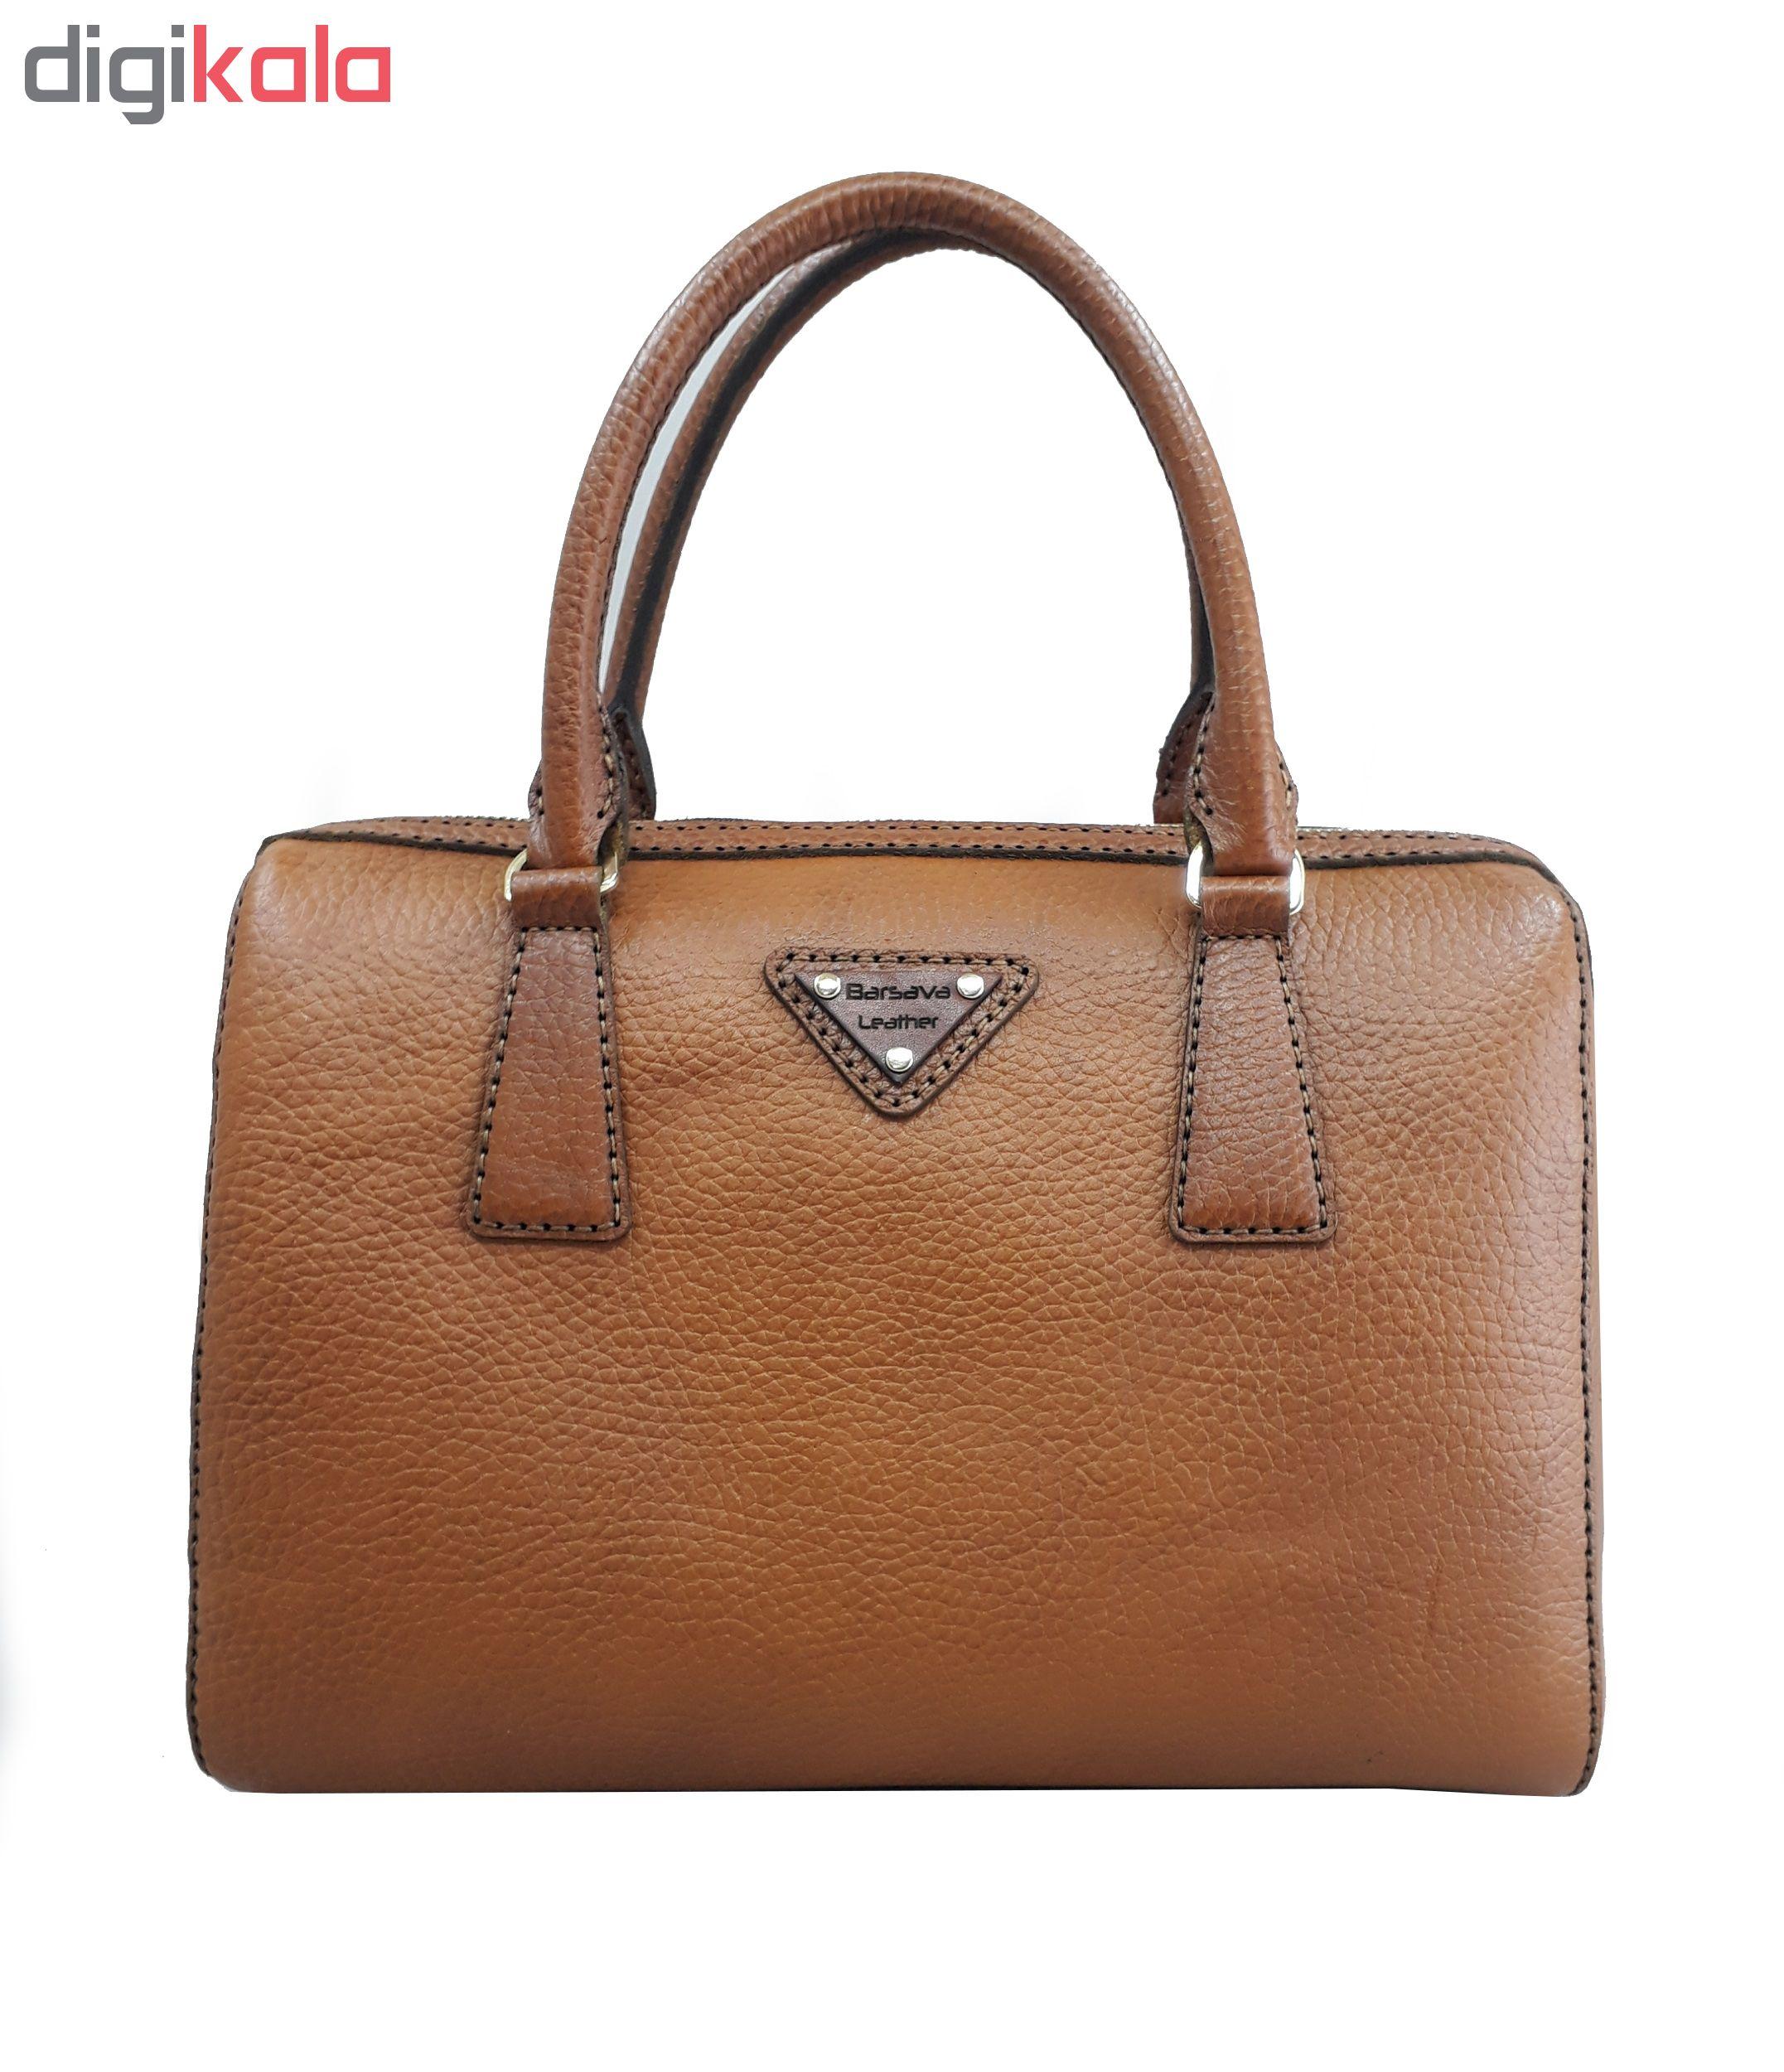 کیف دستی زنانه چرم بارثاوا کد 1374B